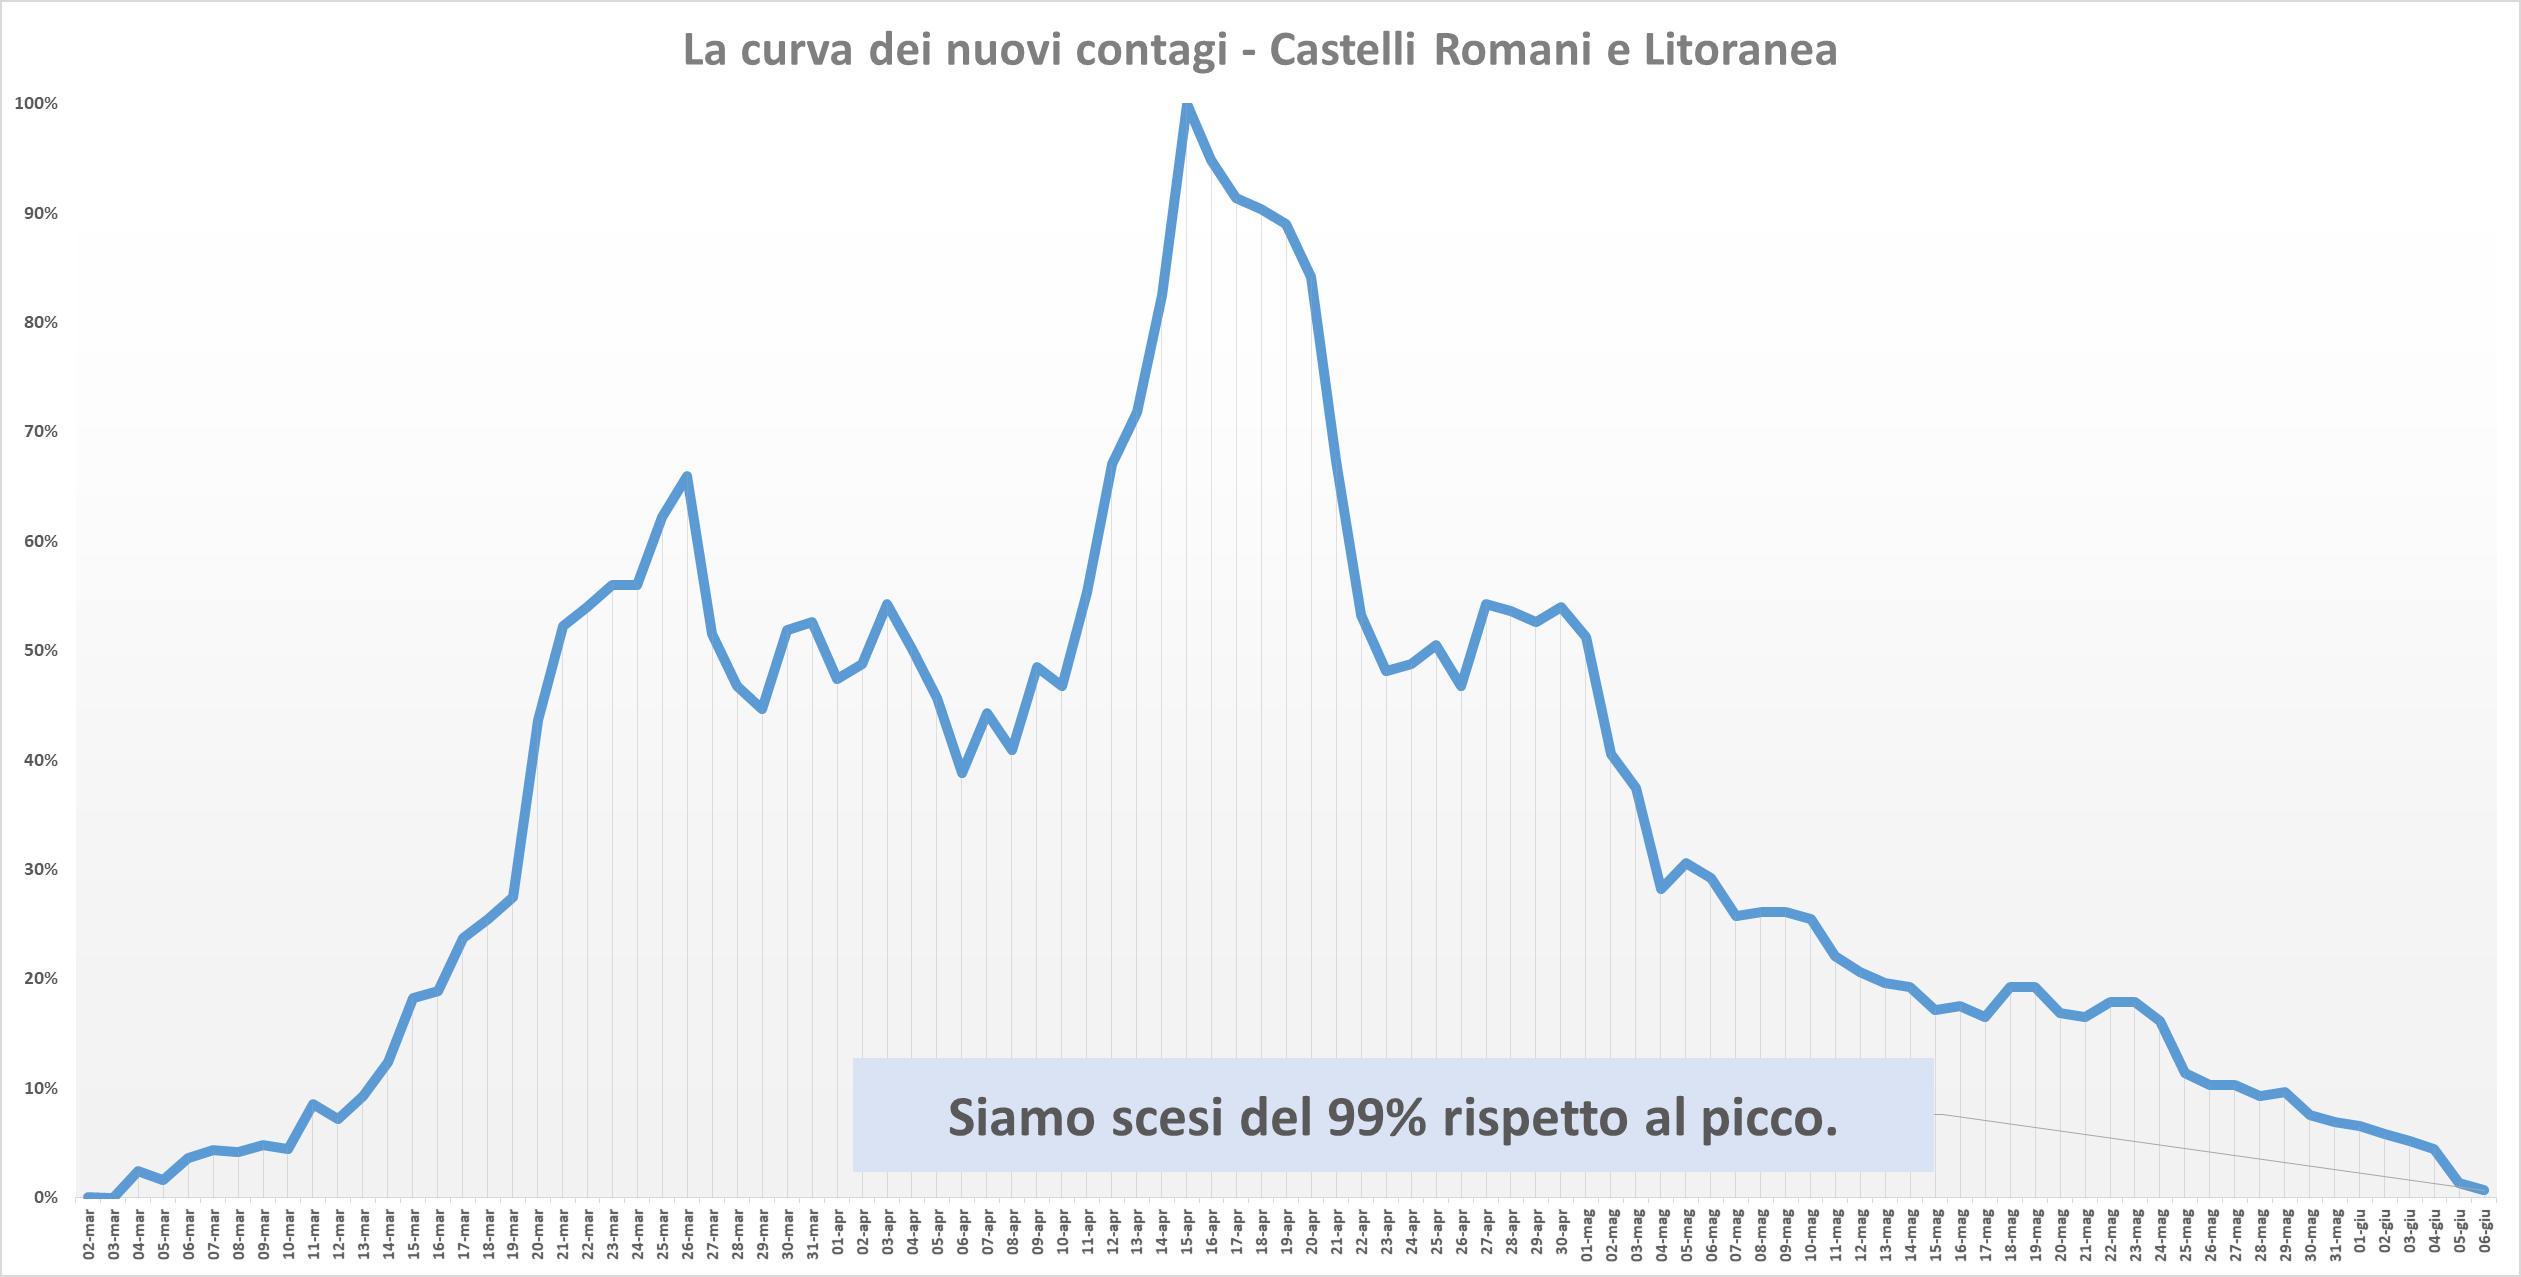 Coronavirus nel Lazio: il focolaio al San Raffaele riporta i